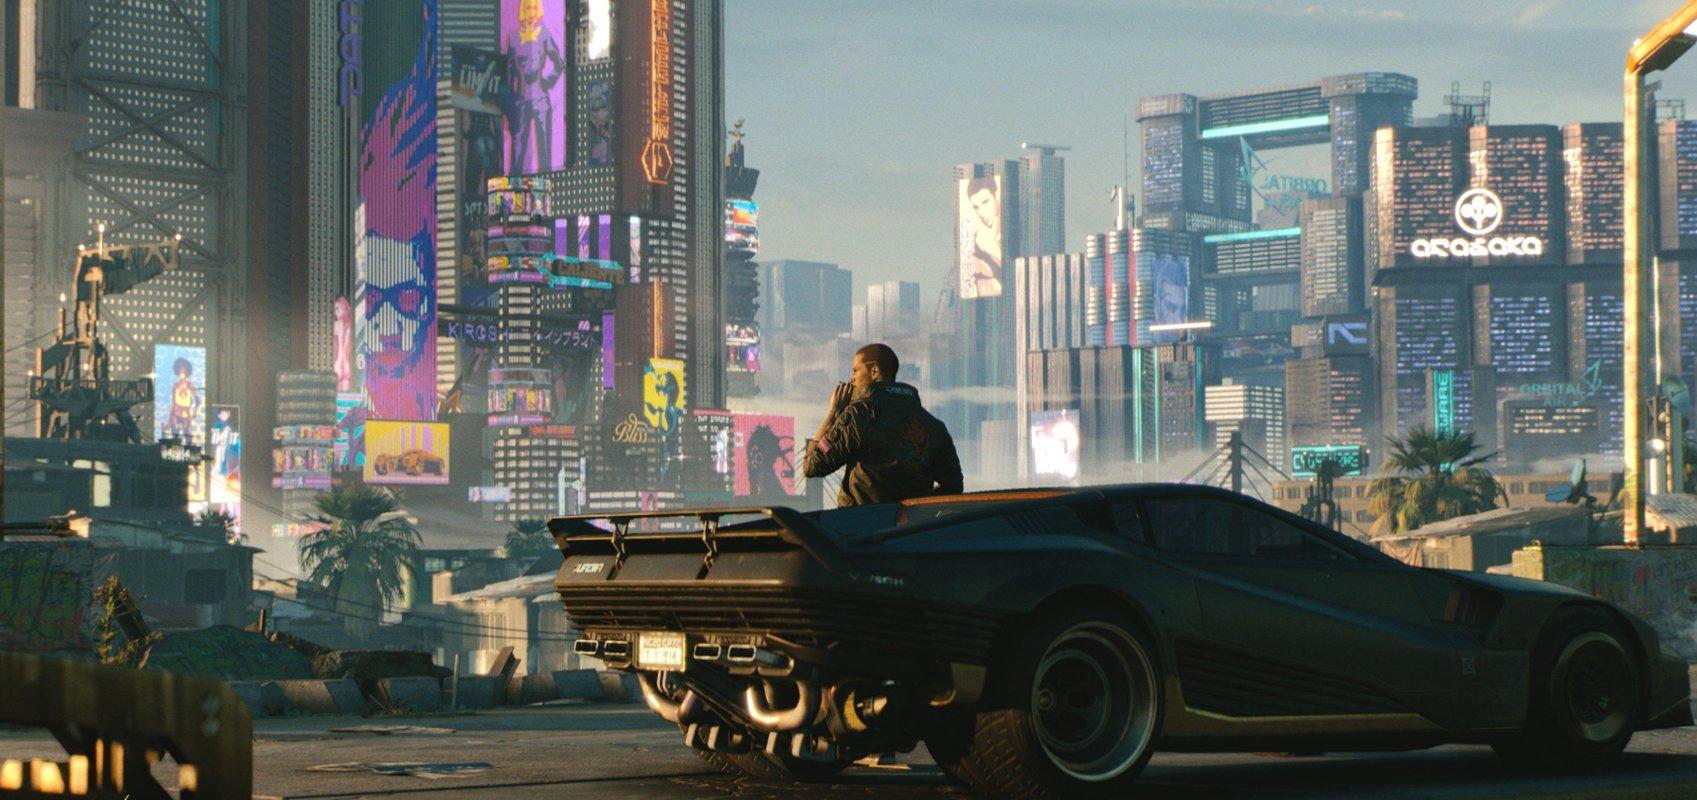 CYBERPUNK 2077 – Gameplay and Video